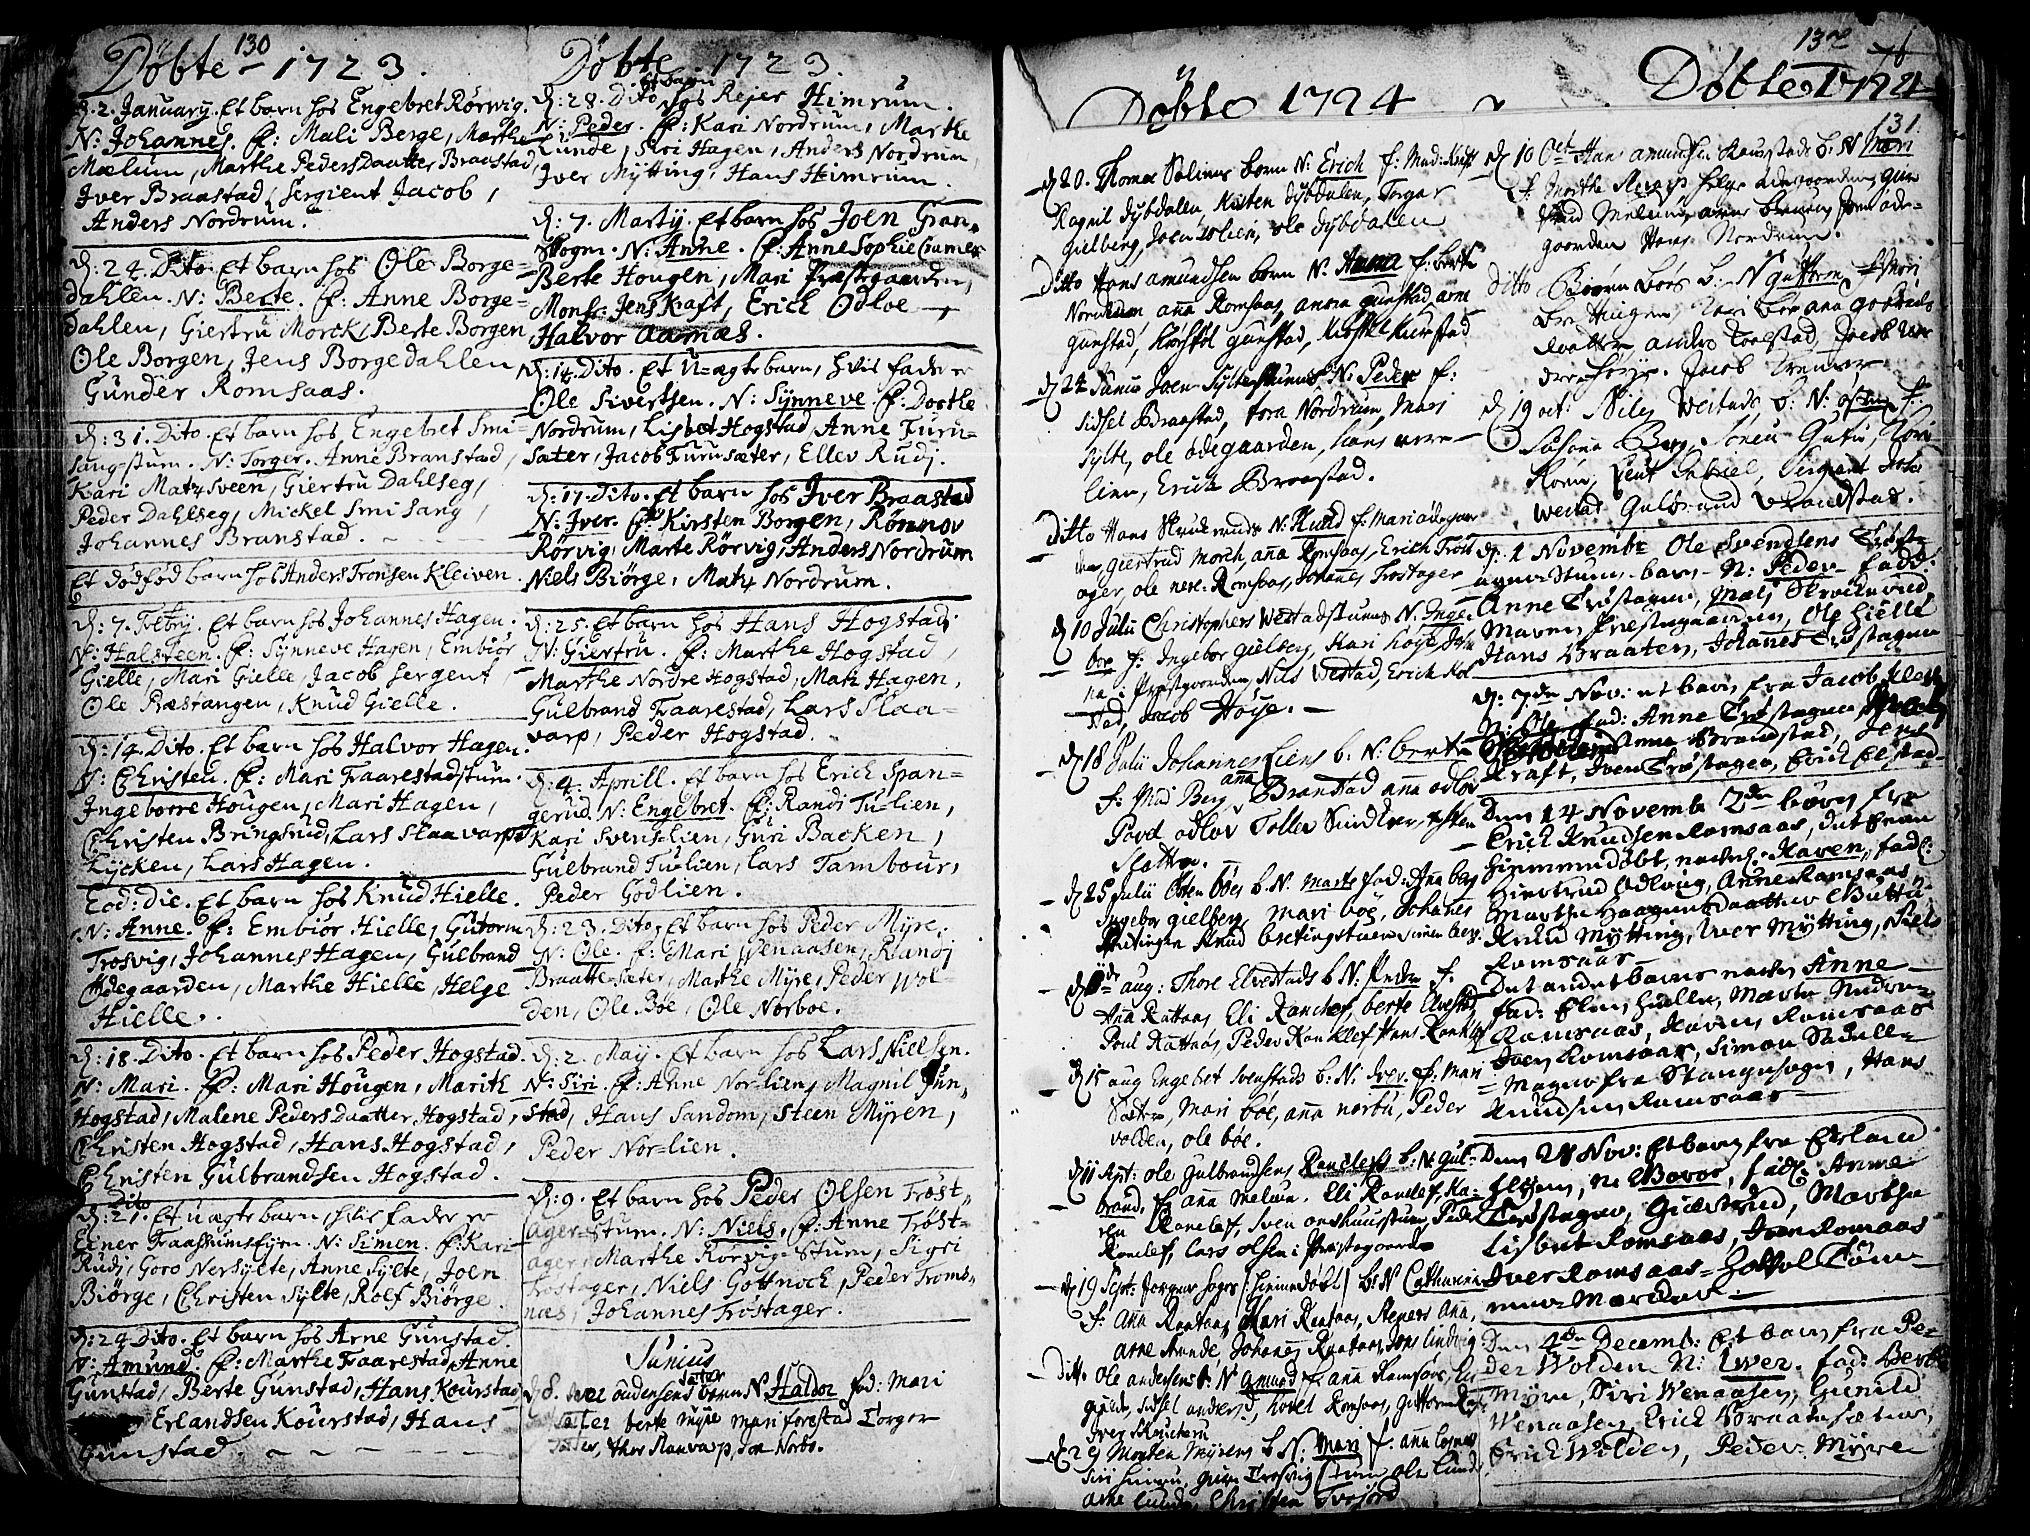 SAH, Ringebu prestekontor, Ministerialbok nr. 1, 1696-1733, s. 130-131